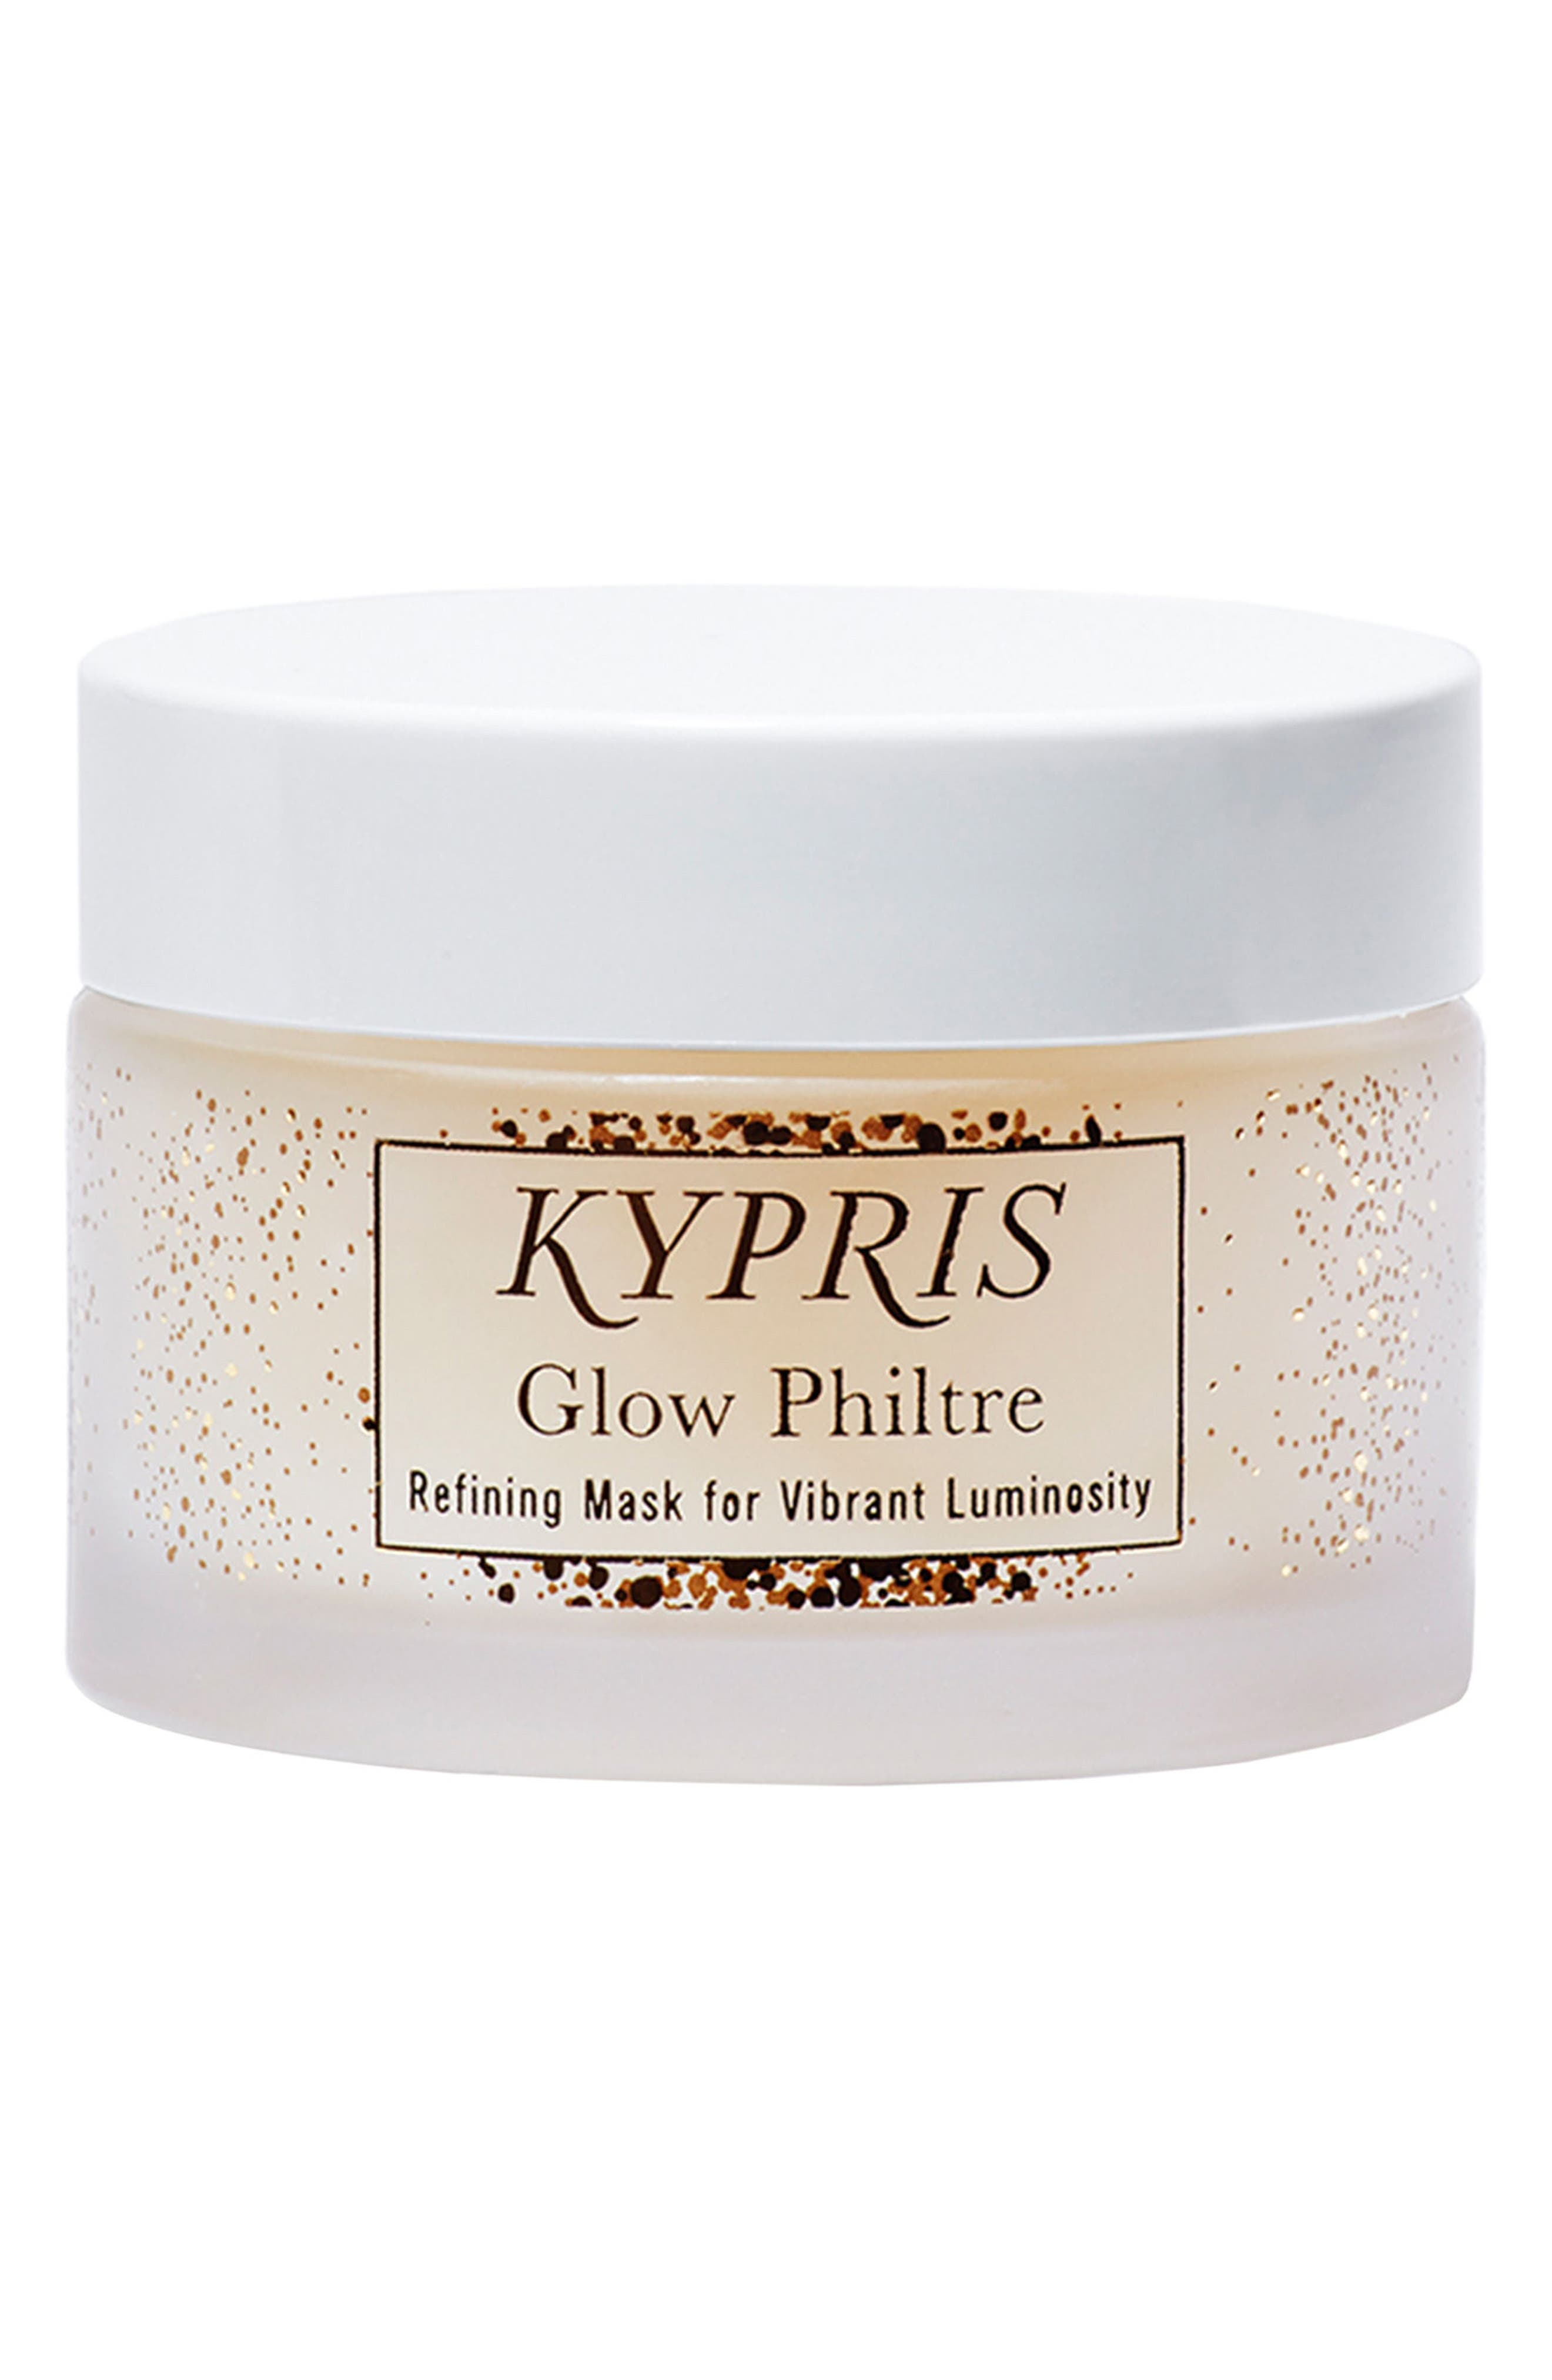 KYPRIS Beauty Glow Philtre Refining Mask for Vibrant Luminosity